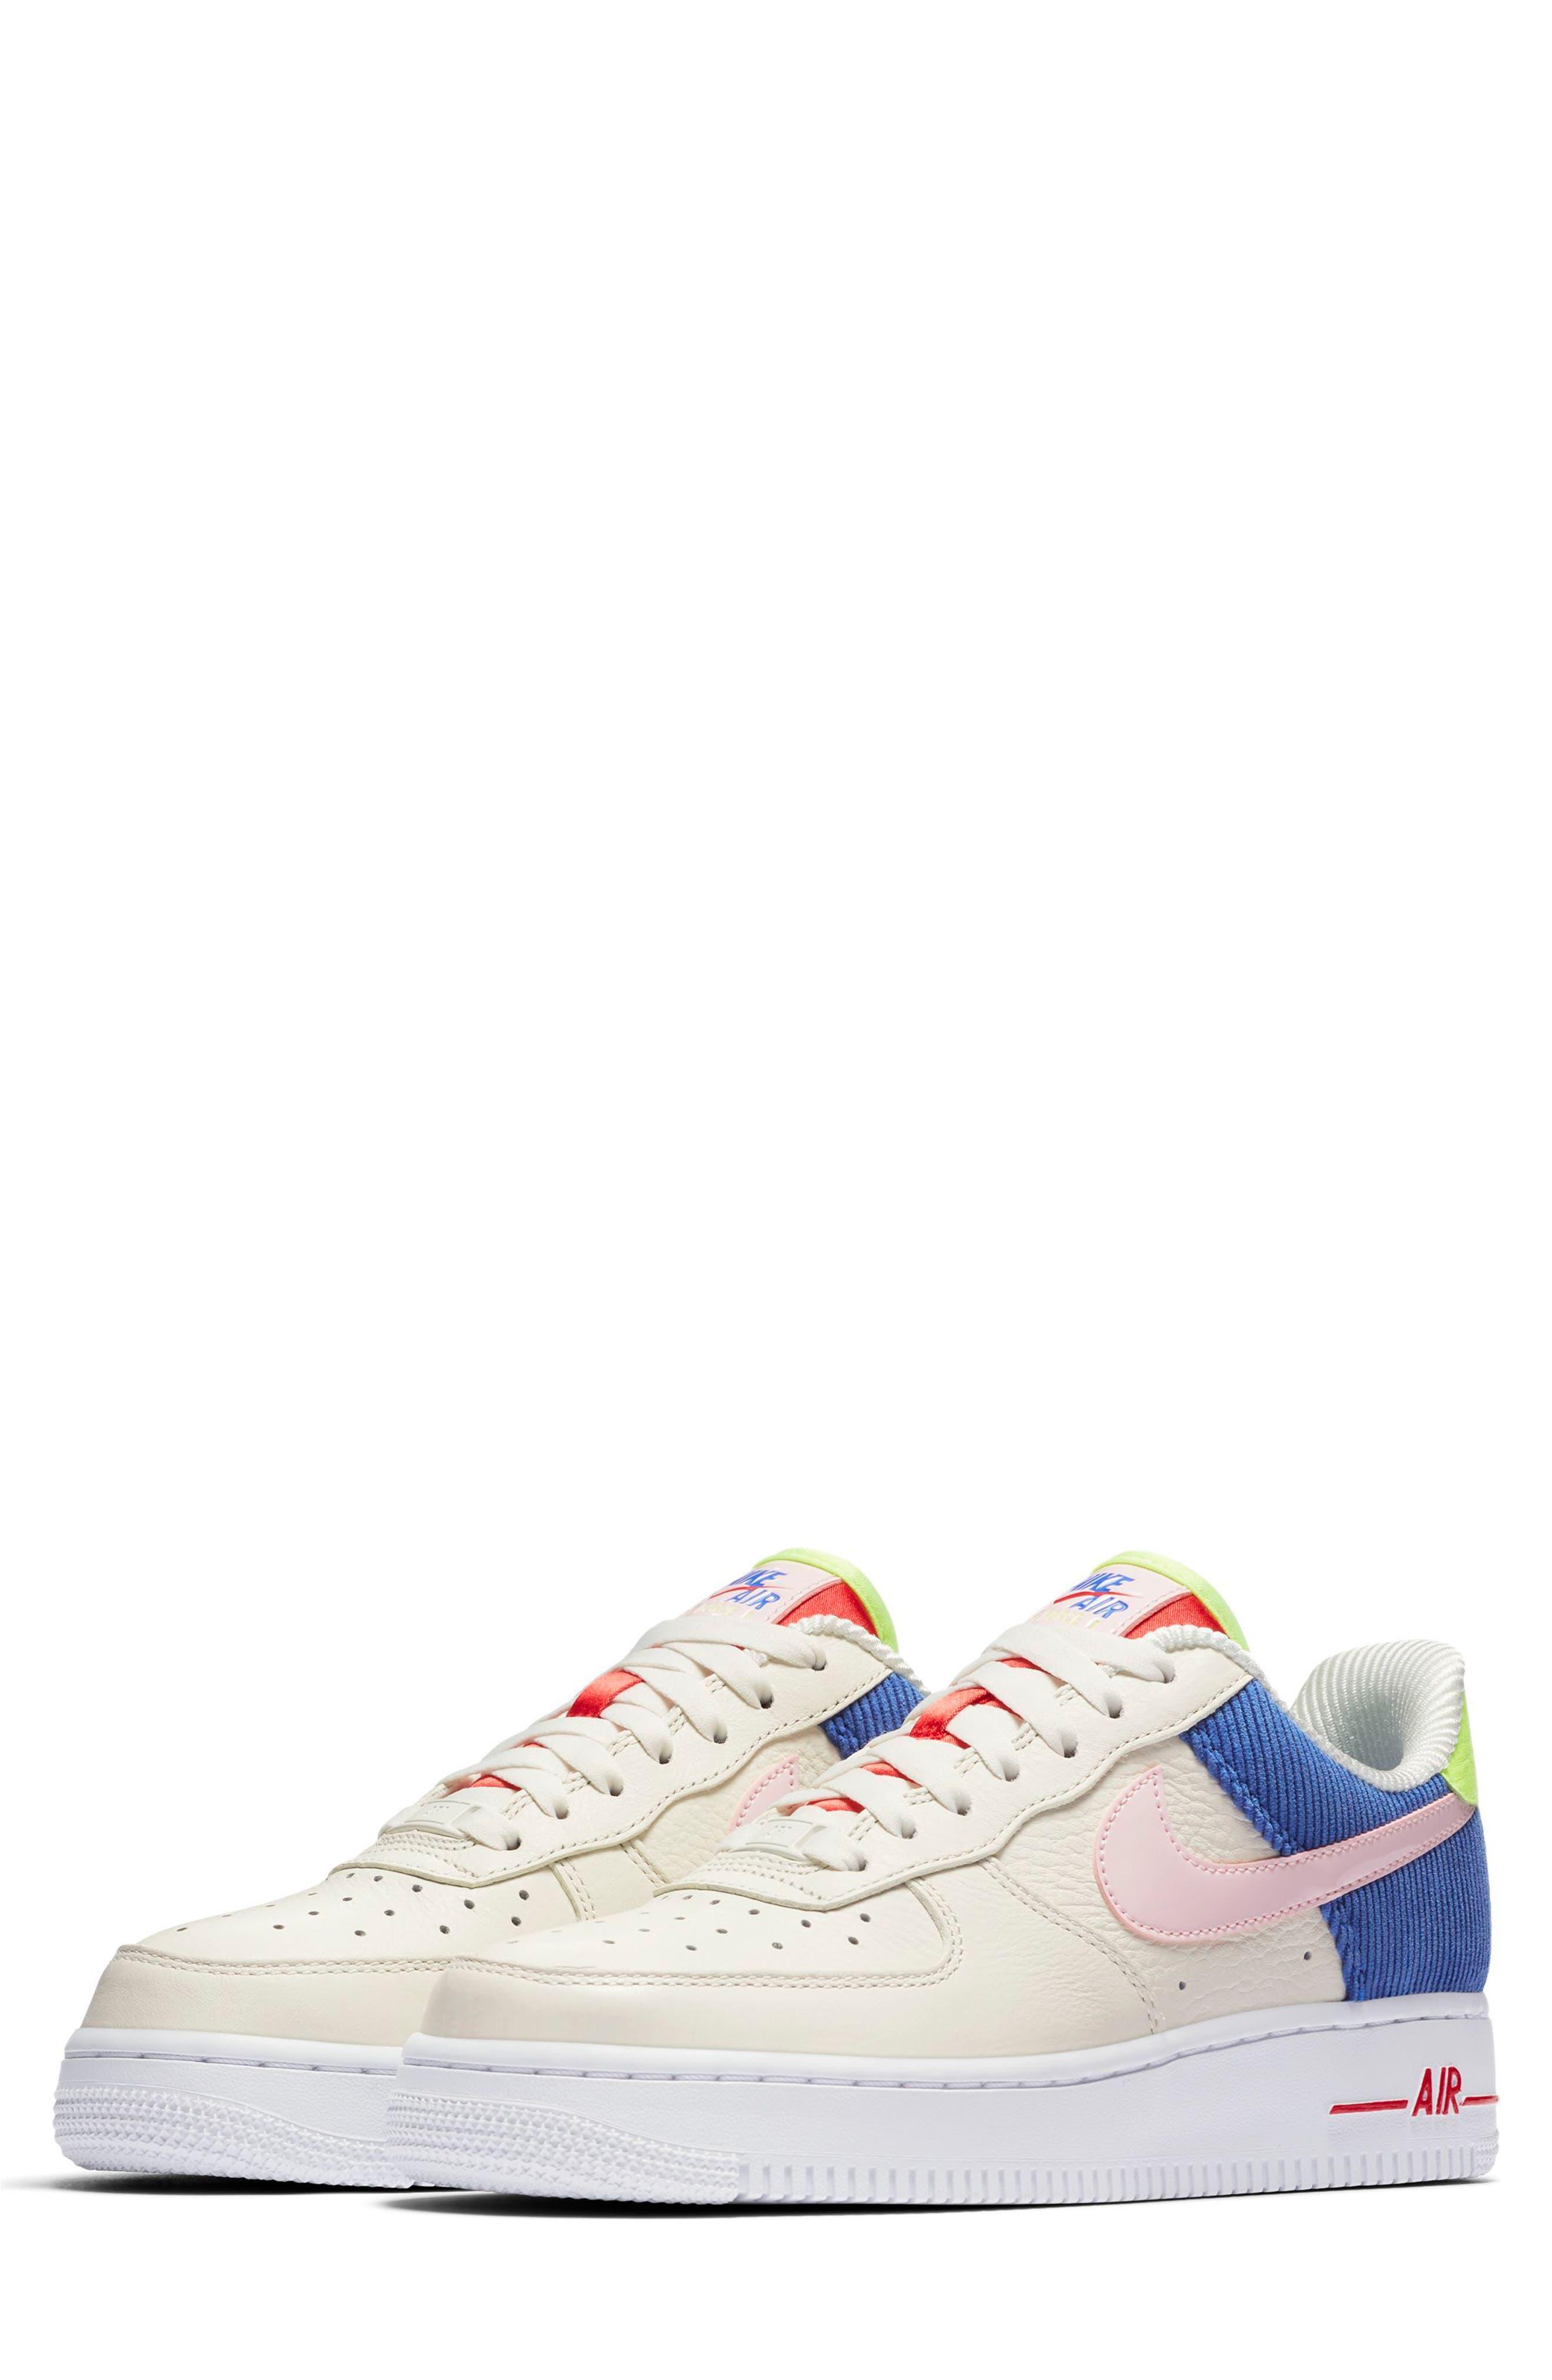 Air Force 1 Low Top Sneaker,                             Main thumbnail 1, color,                             Sail/ Arctic Pink-Racer Blue